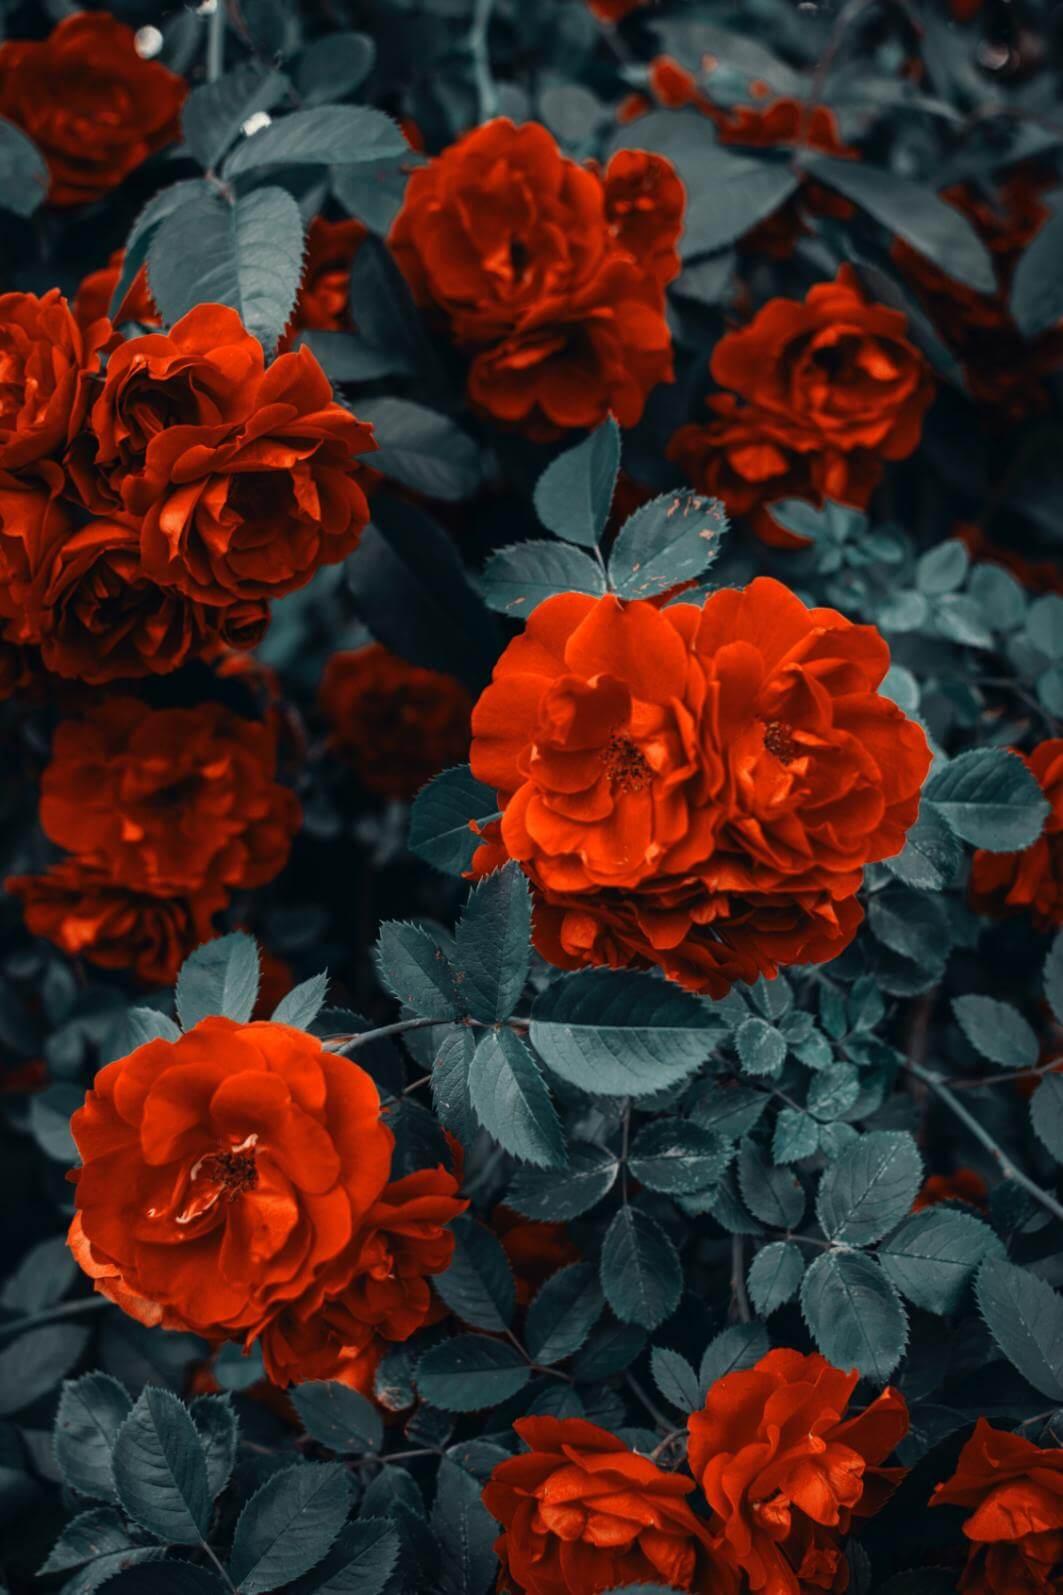 Red Roses - Original image